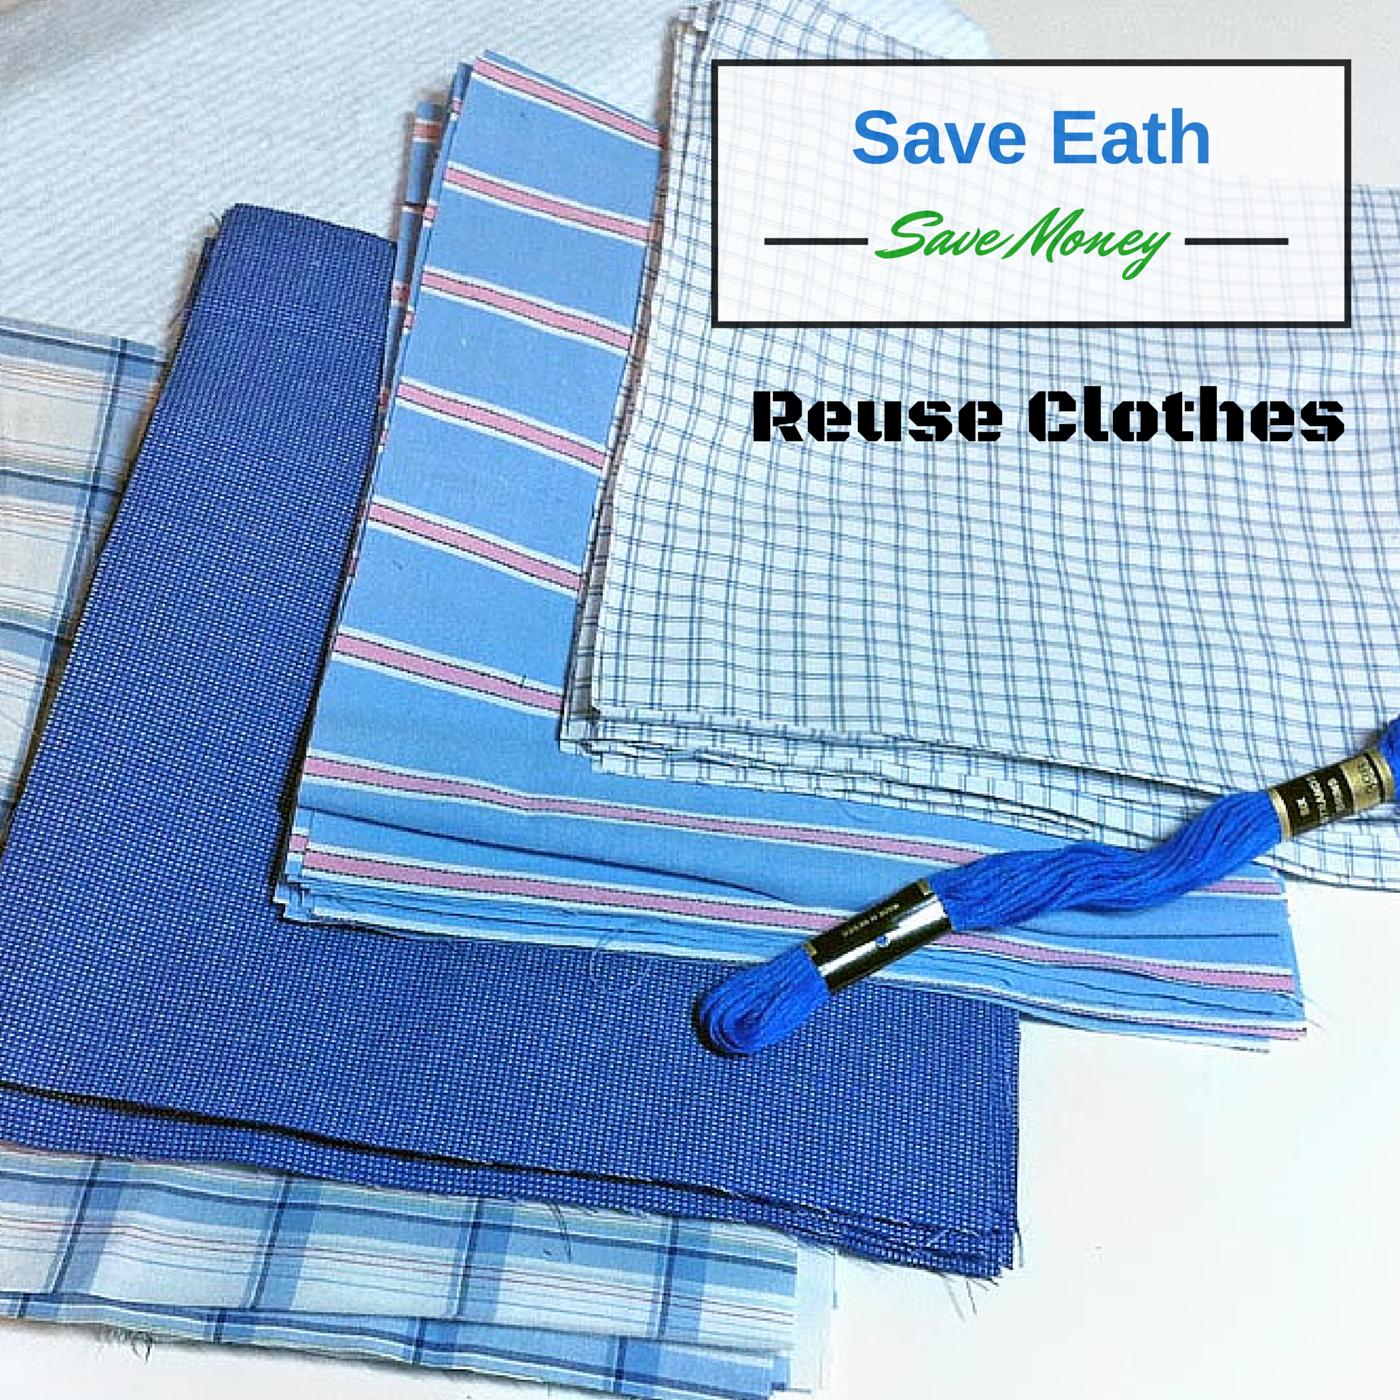 Reuse Clothes